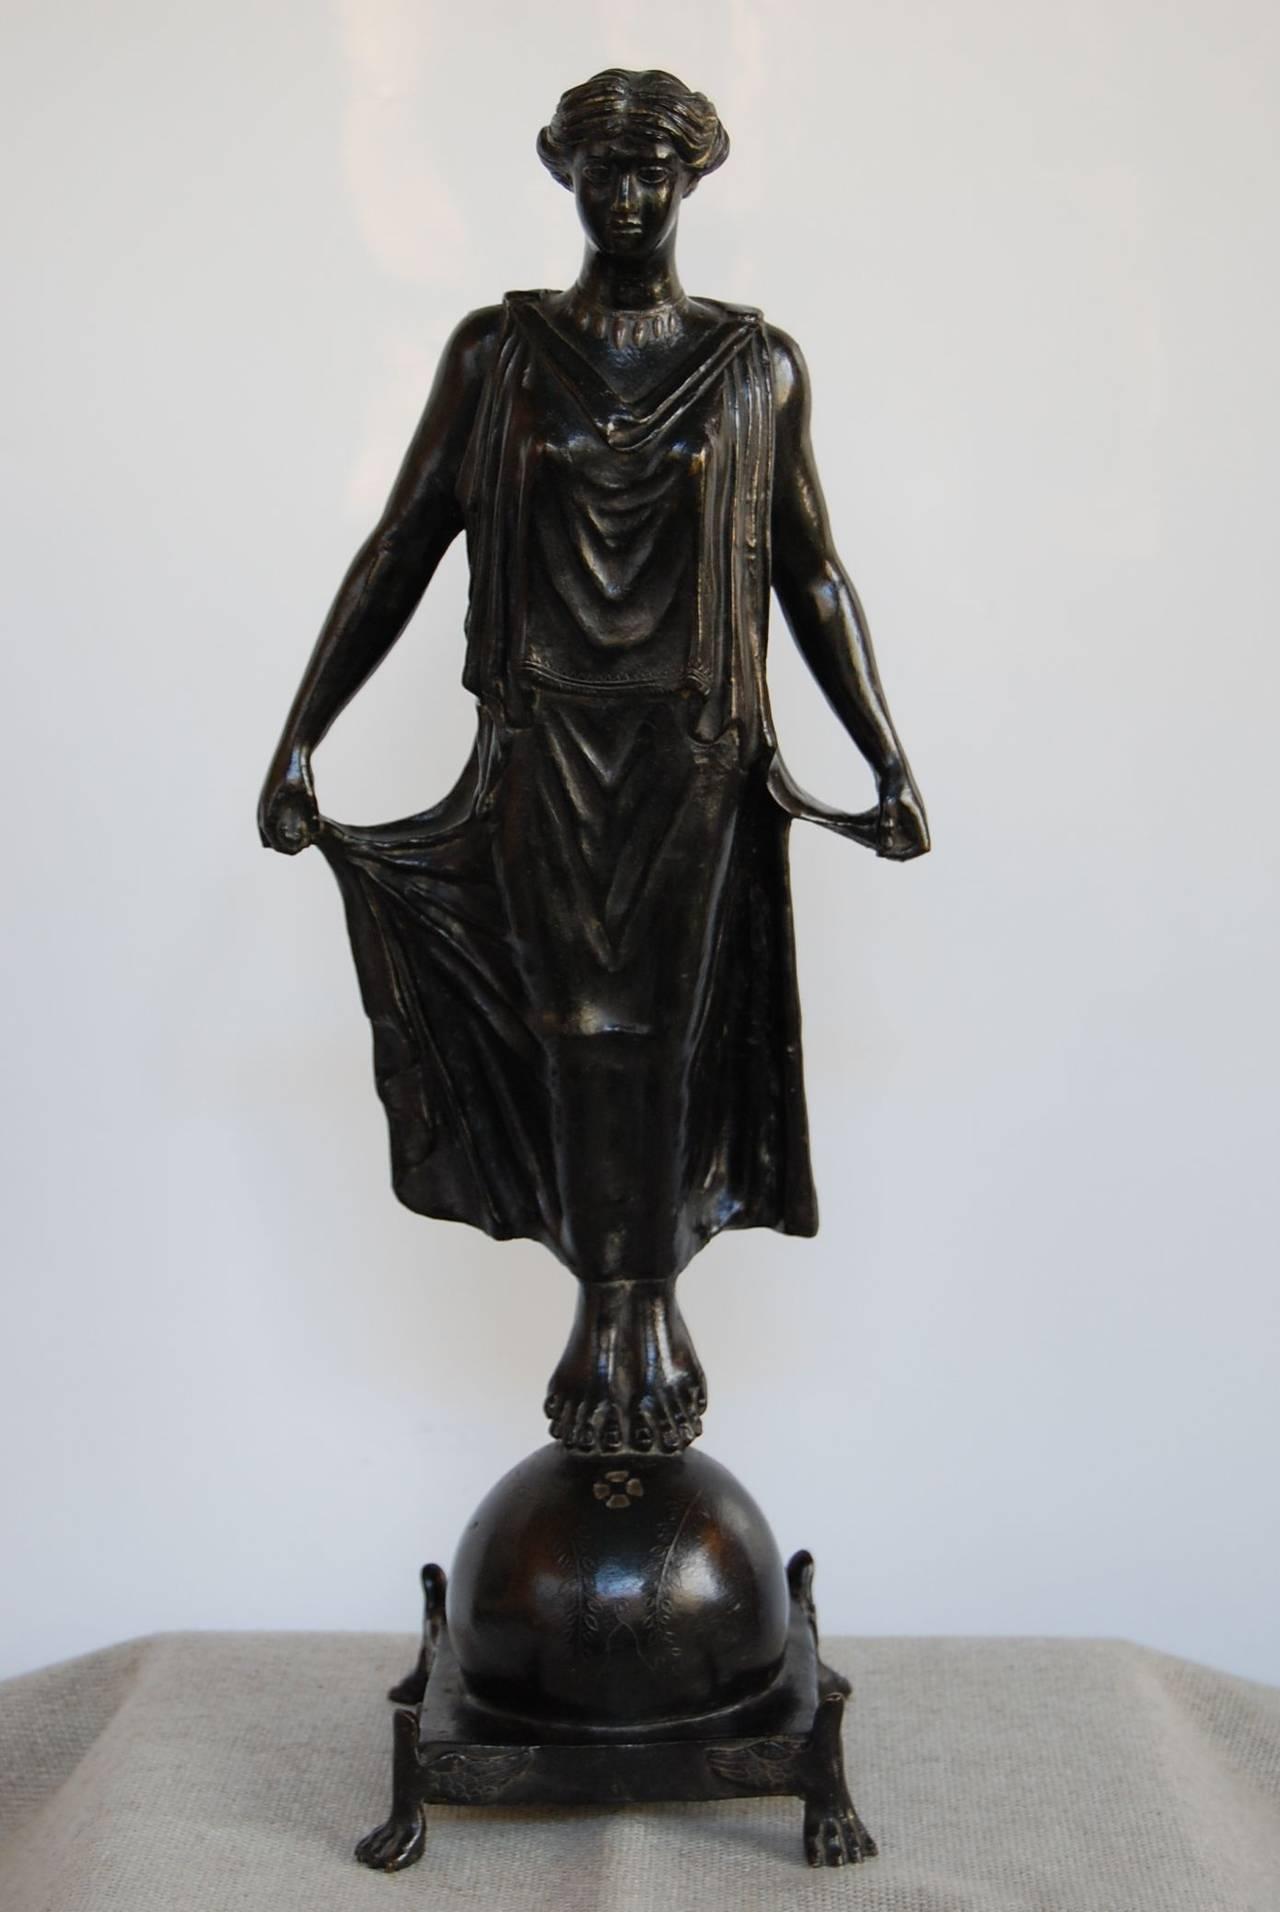 Beautiful figure standing 17